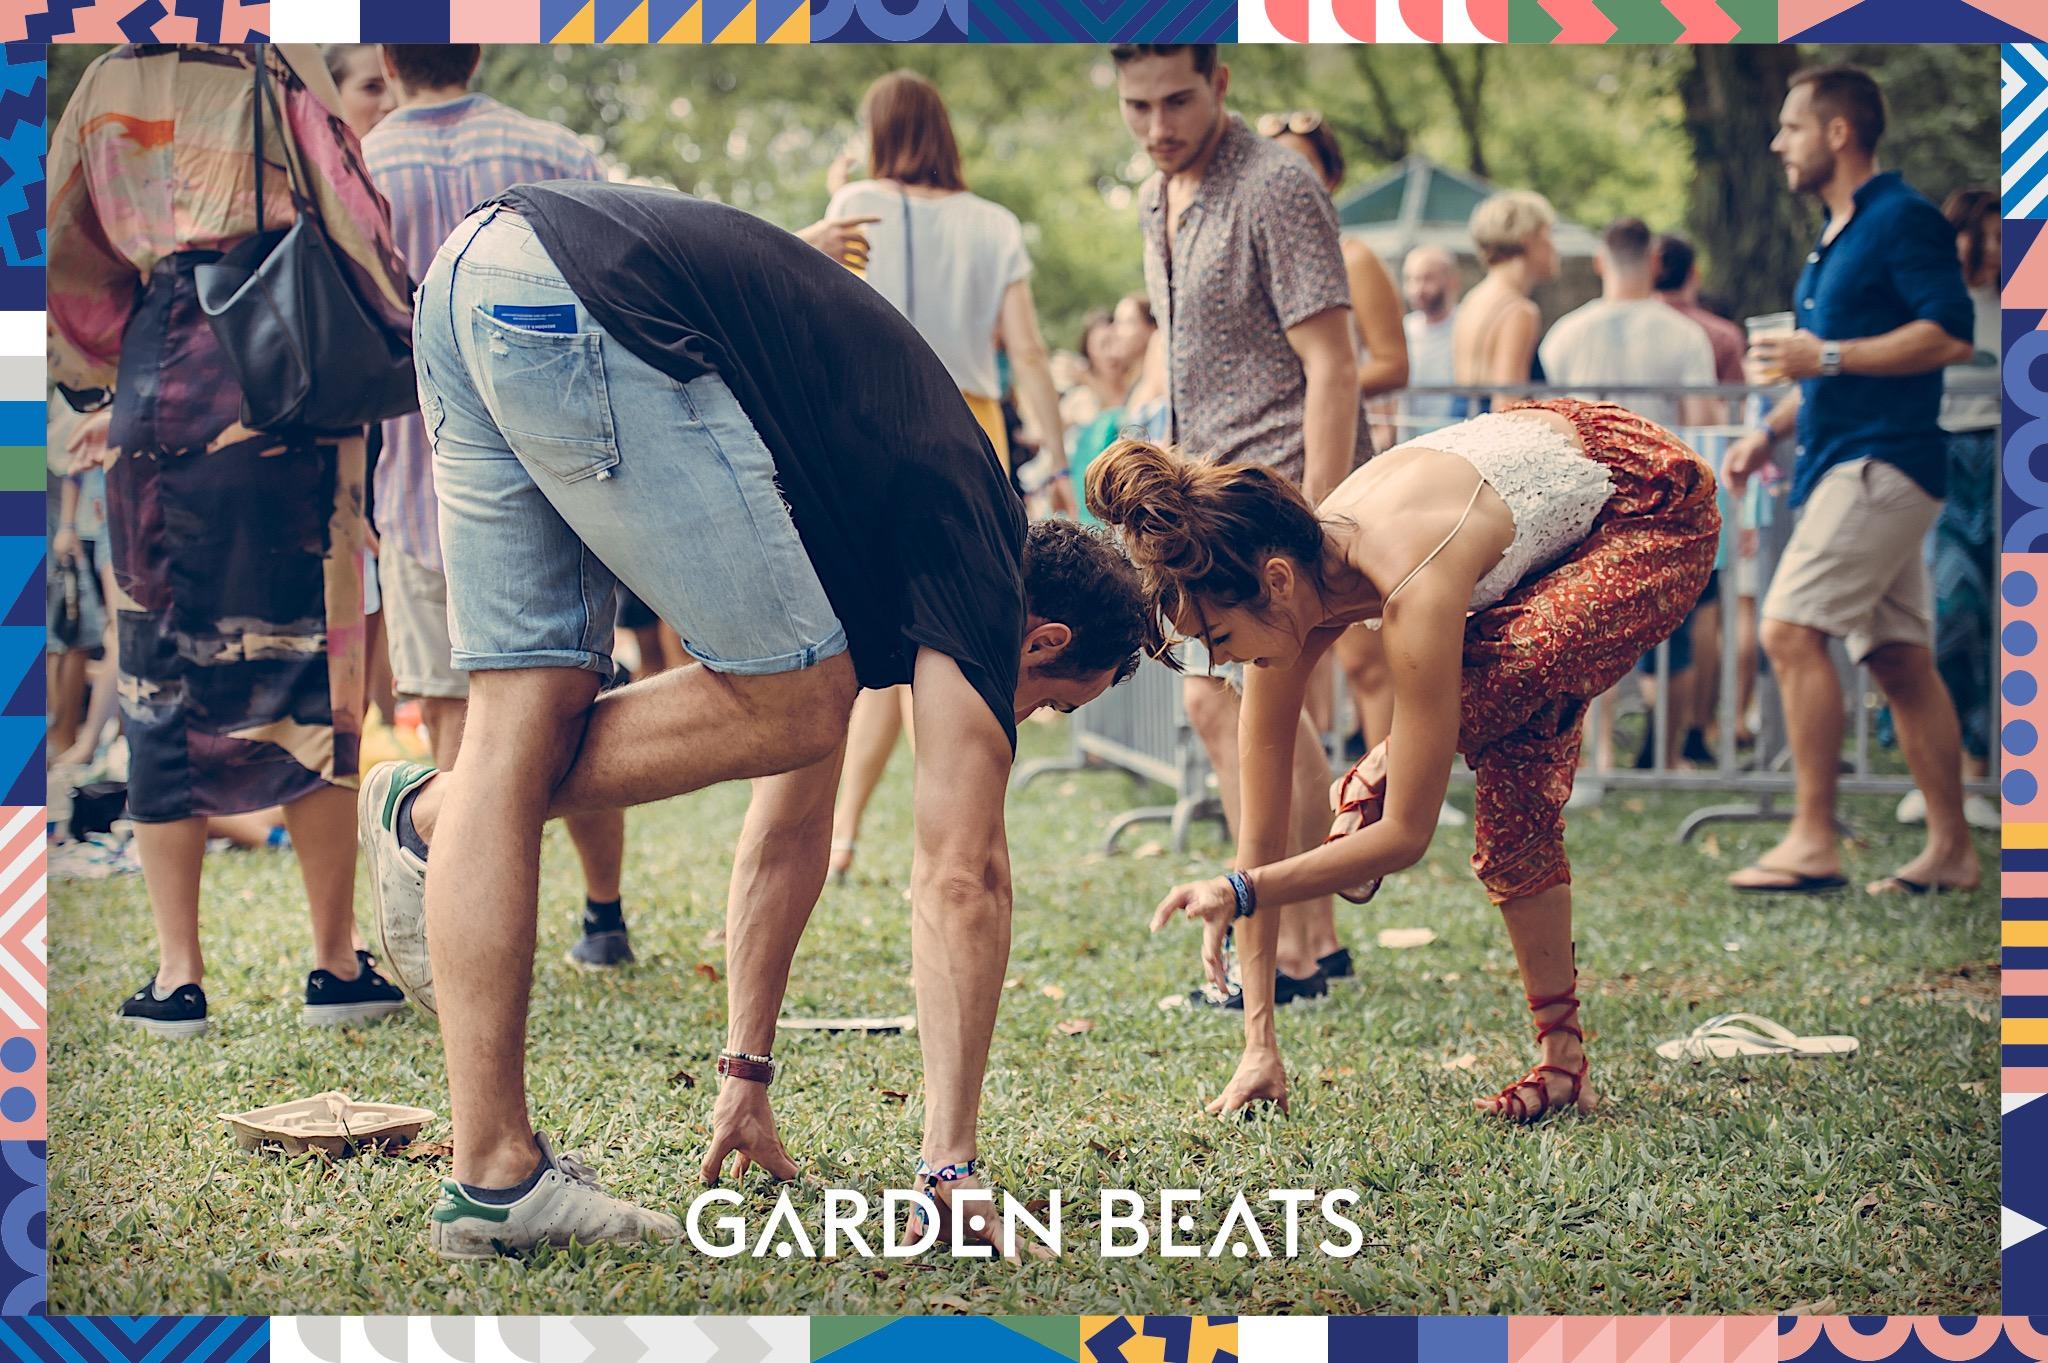 03032018_GardenBeats_Colossal568_Watermarked.jpg